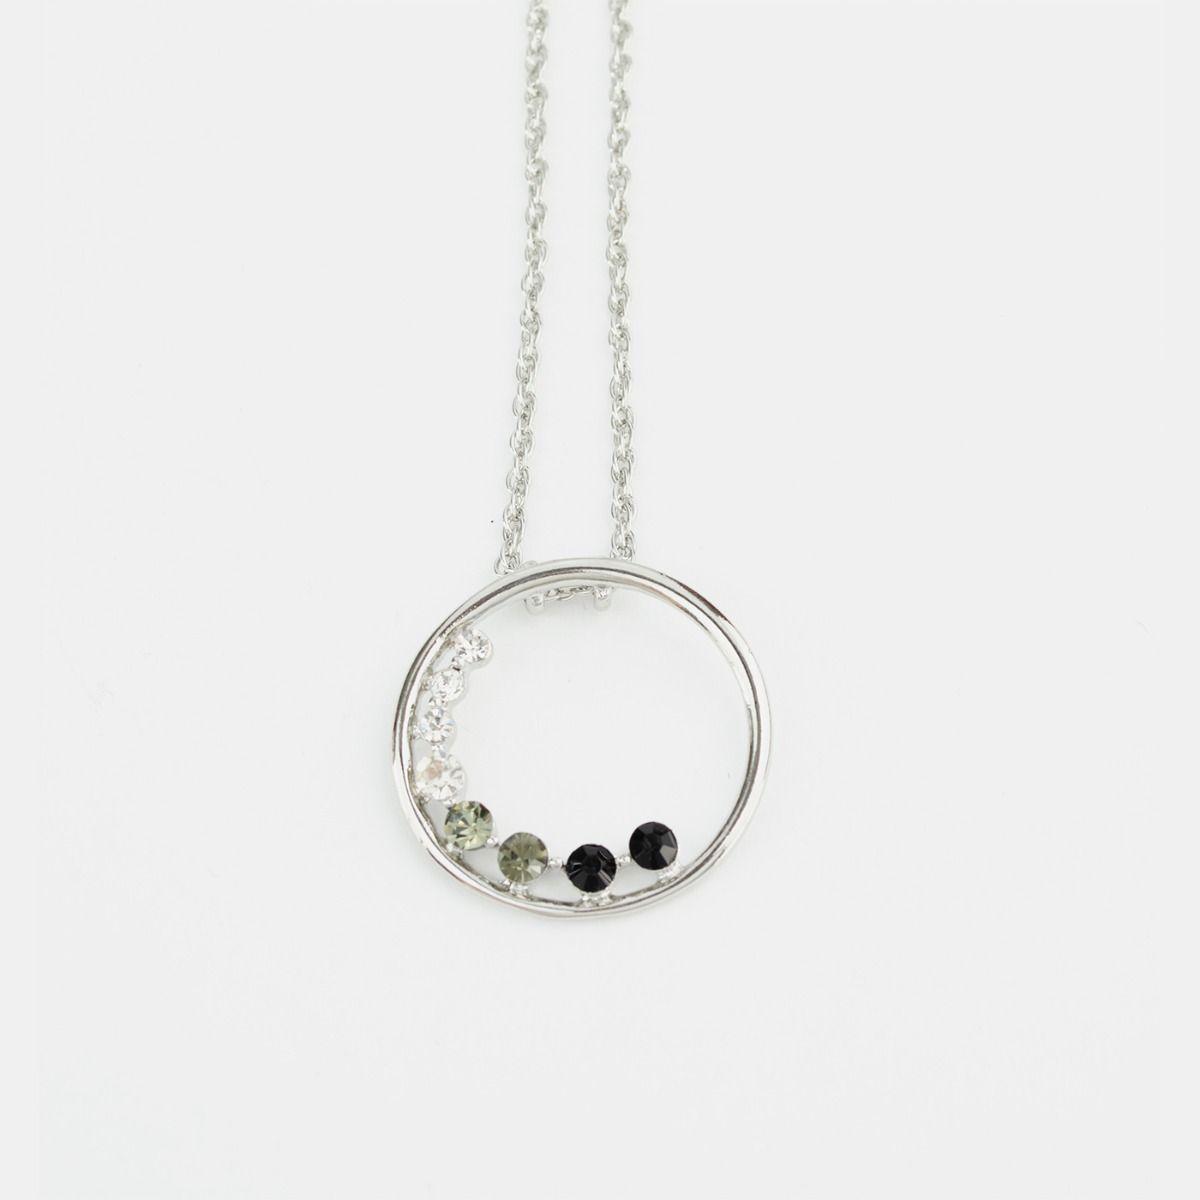 Fiorelli Fashion Imitation Rhodium Plated Open Circle Gradient Crystal Necklace 46cm + 5cm